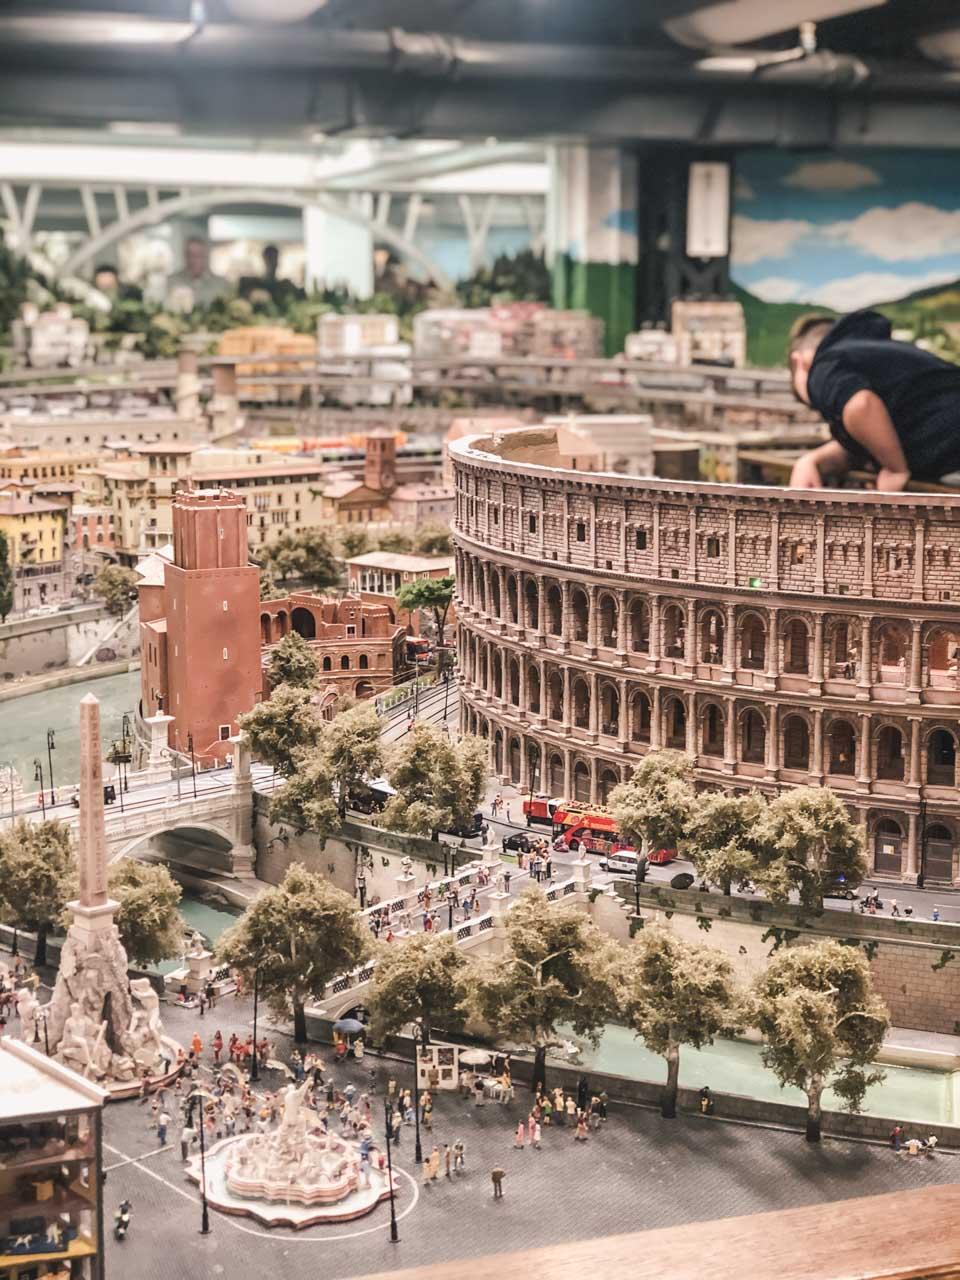 A model of the Colosseum inside Miniatur Wunderland in Hamburg